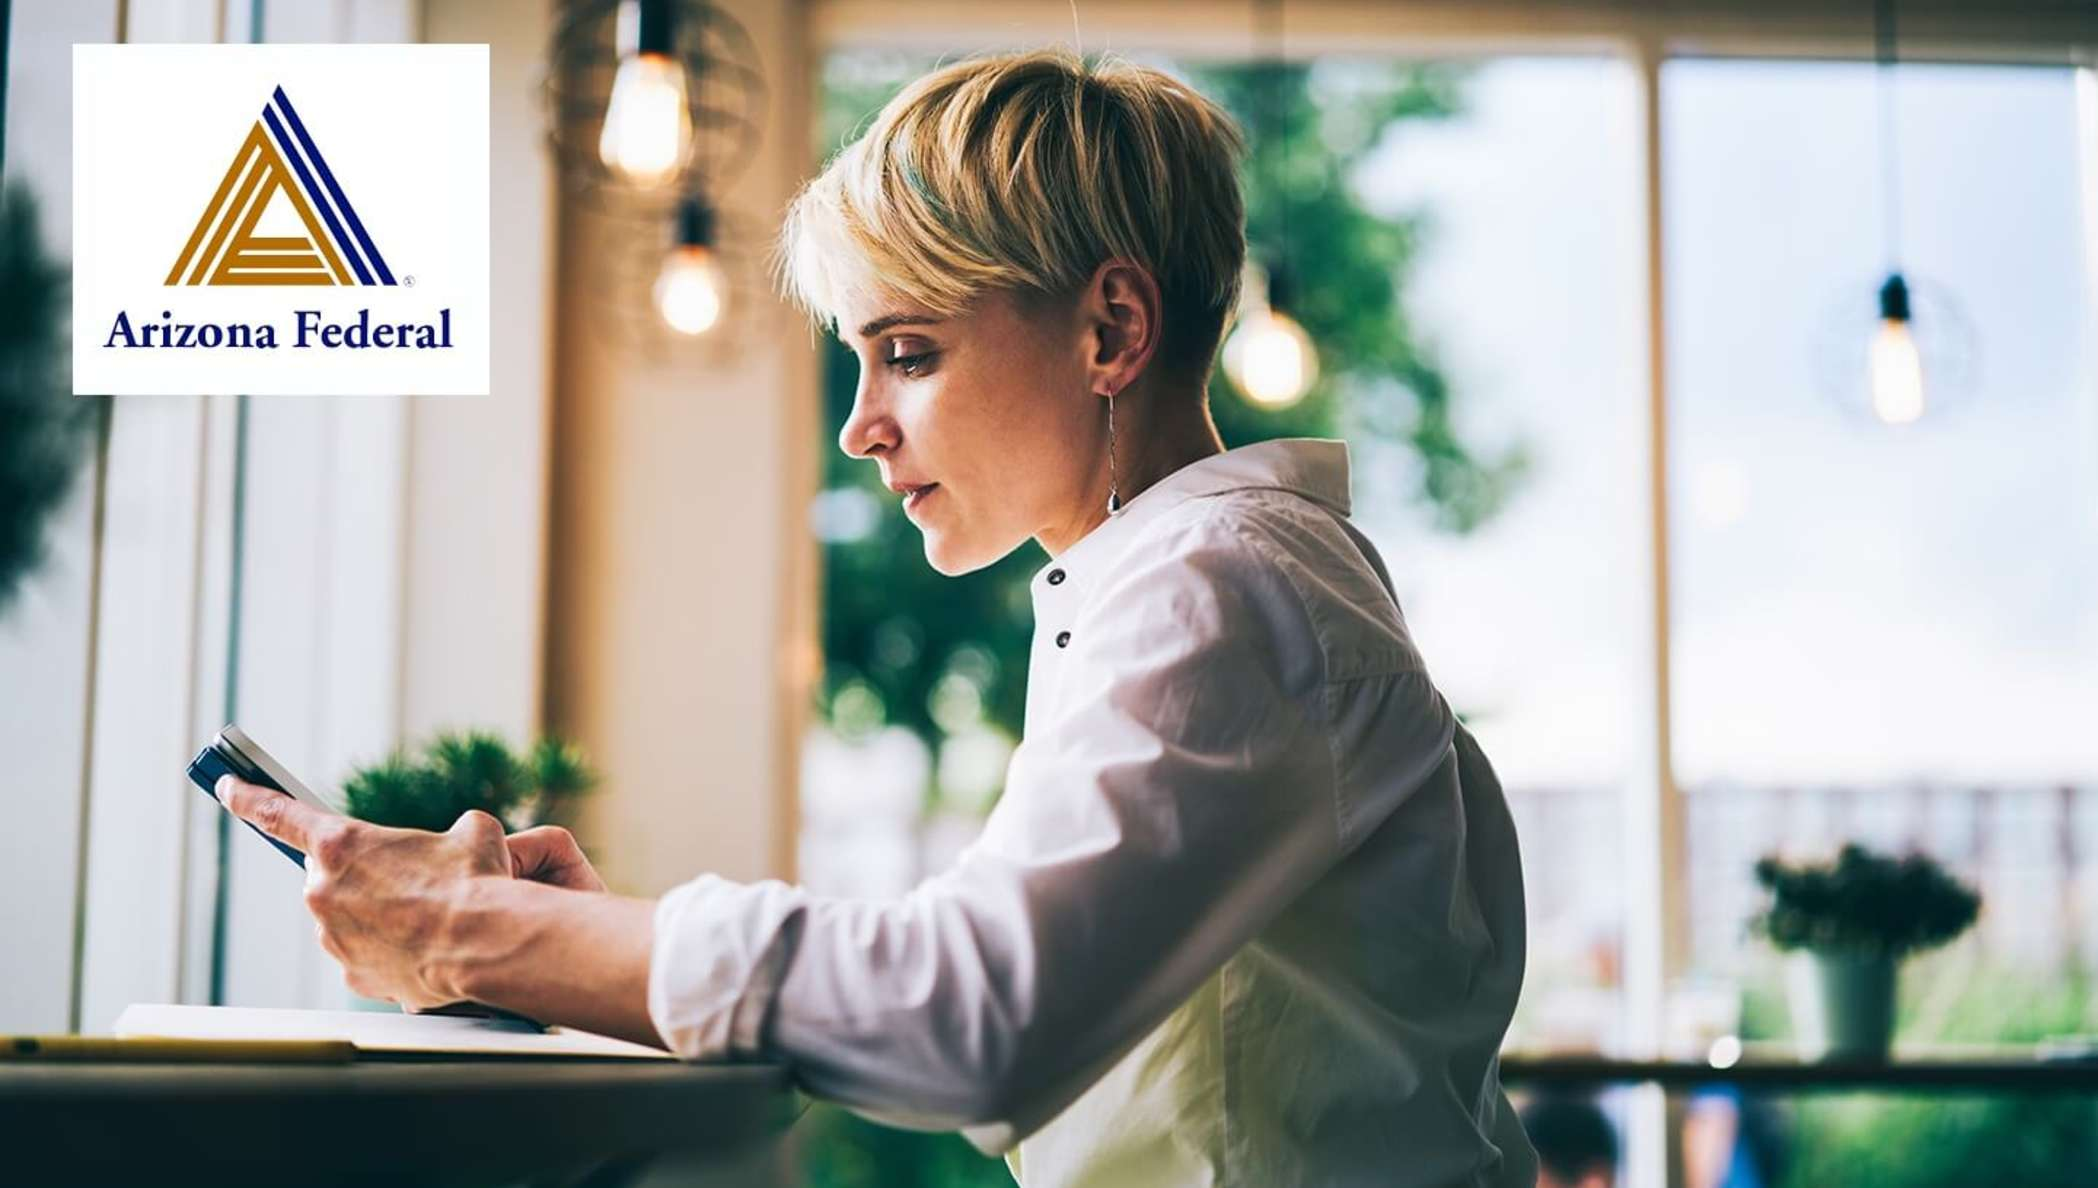 Arizona Federal customer applying for a loan with DocuSign.